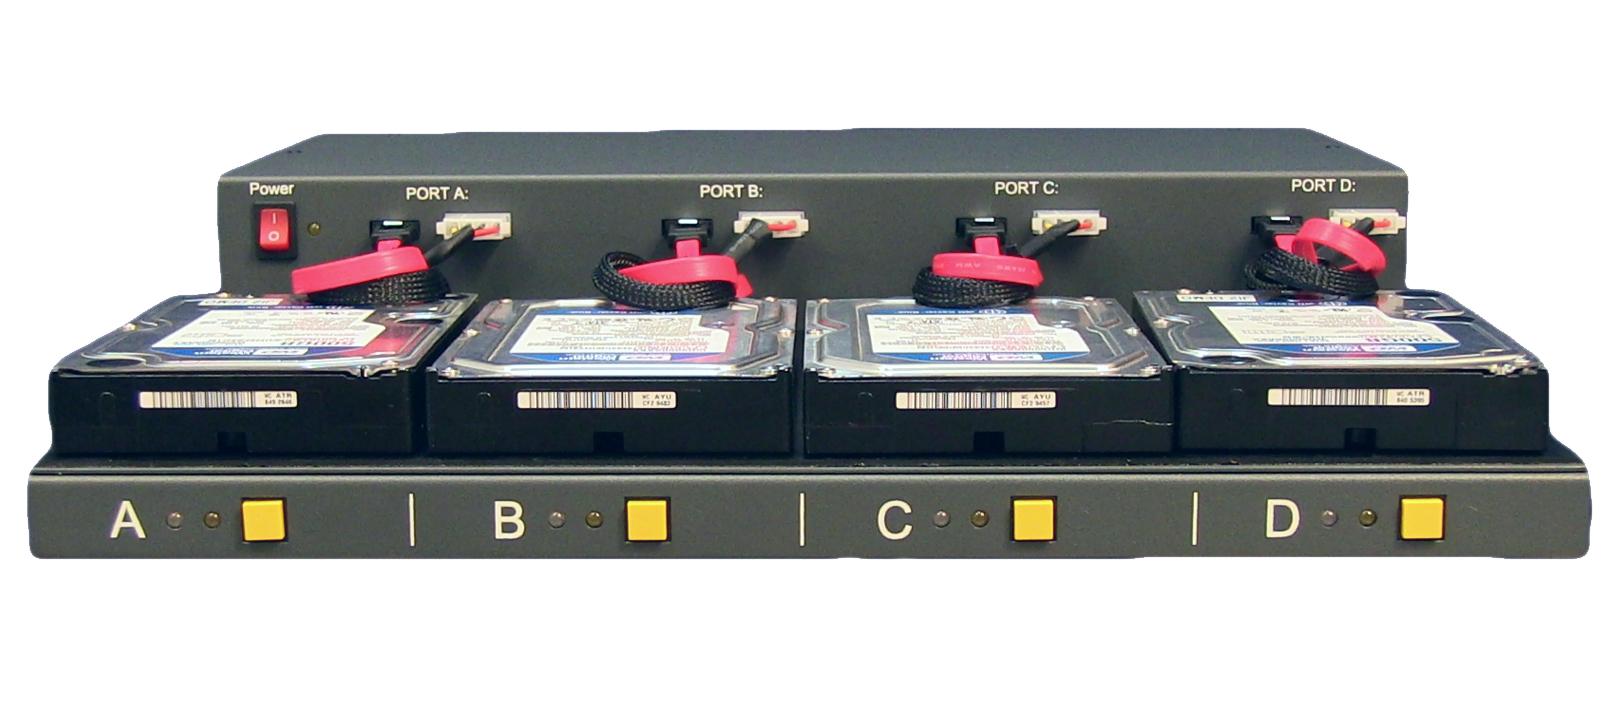 Test, Wipe, Repair: Disk Recycler